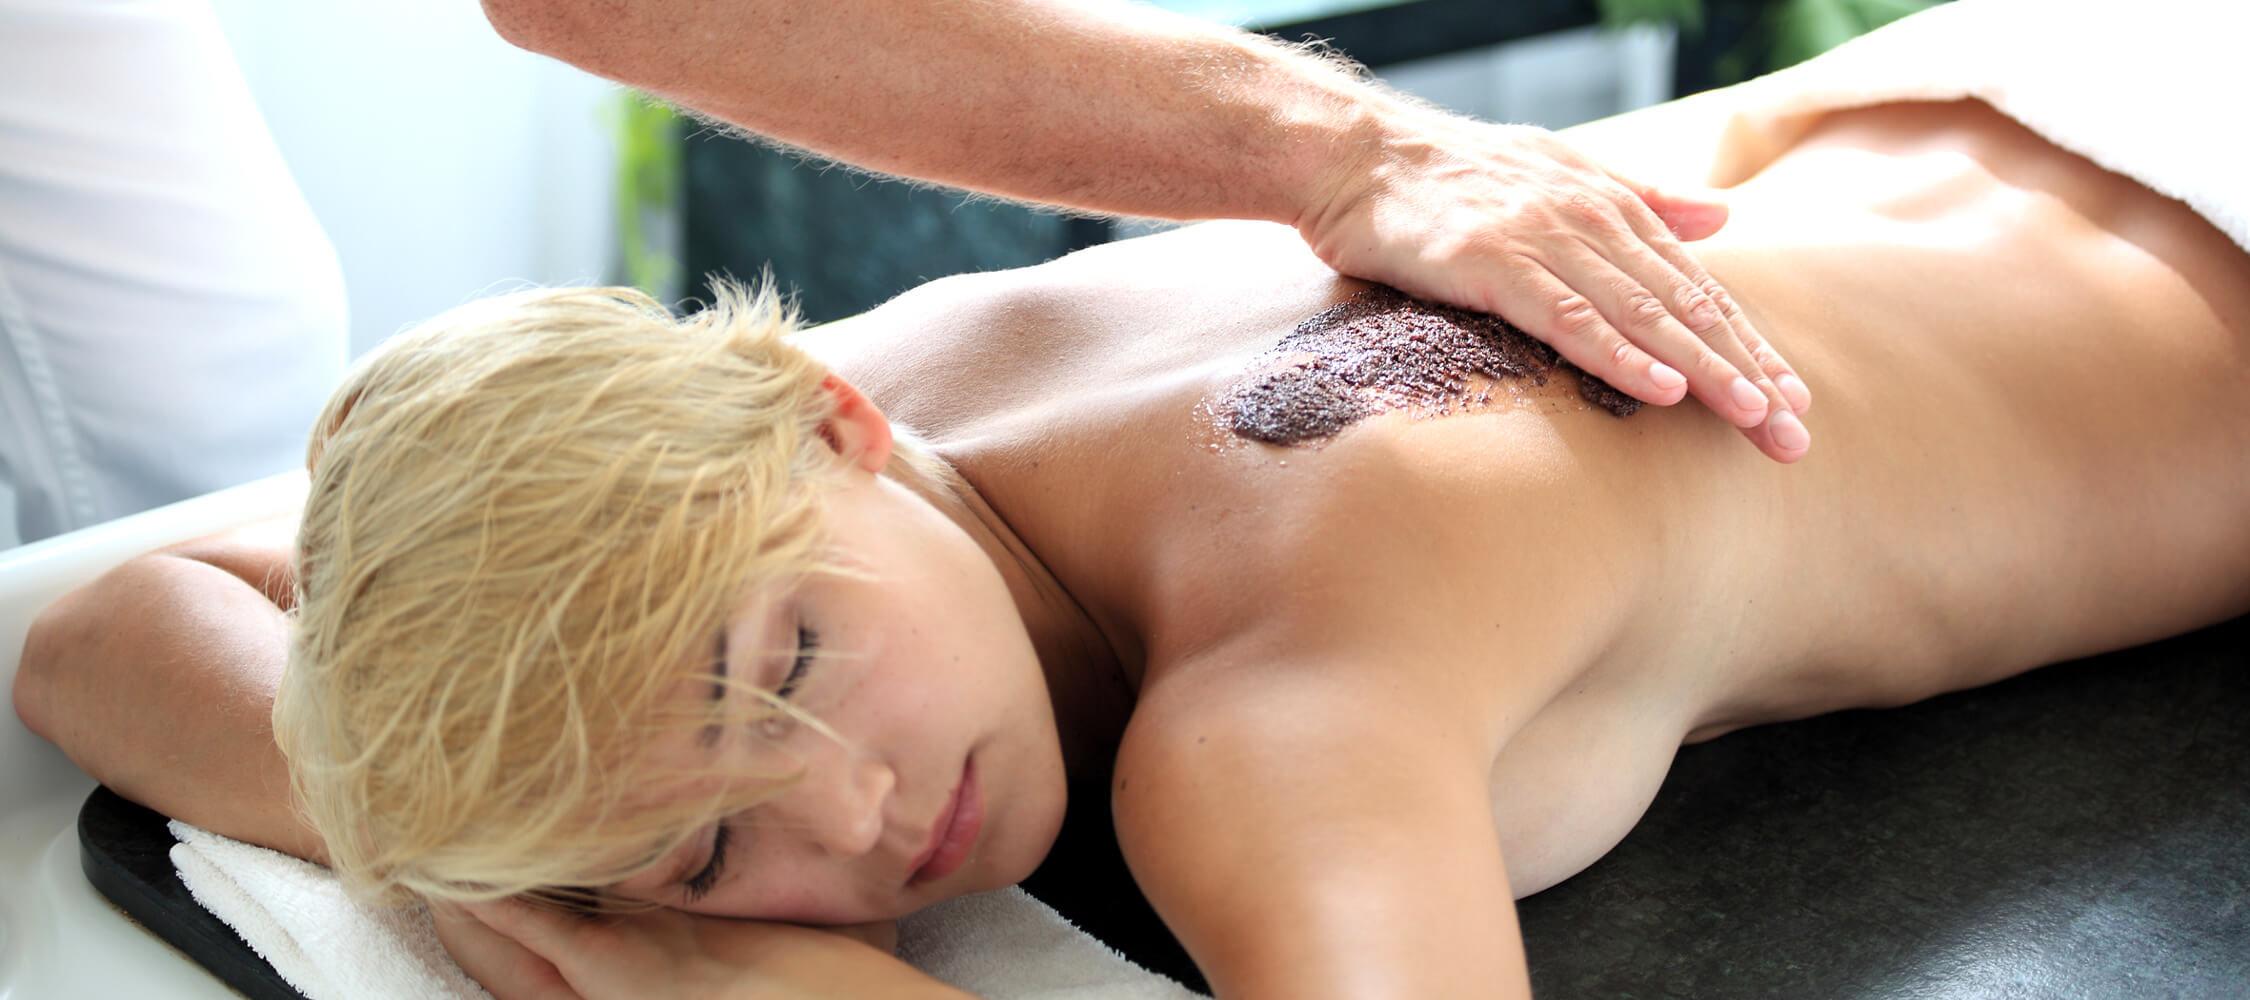 Italien-Trentino_Suedtirol_Alto_Adige_Merano_Meran_Therme_Massage_Trauben_Peeling_Ruecken_Manuela_Prossliner_2250x1000